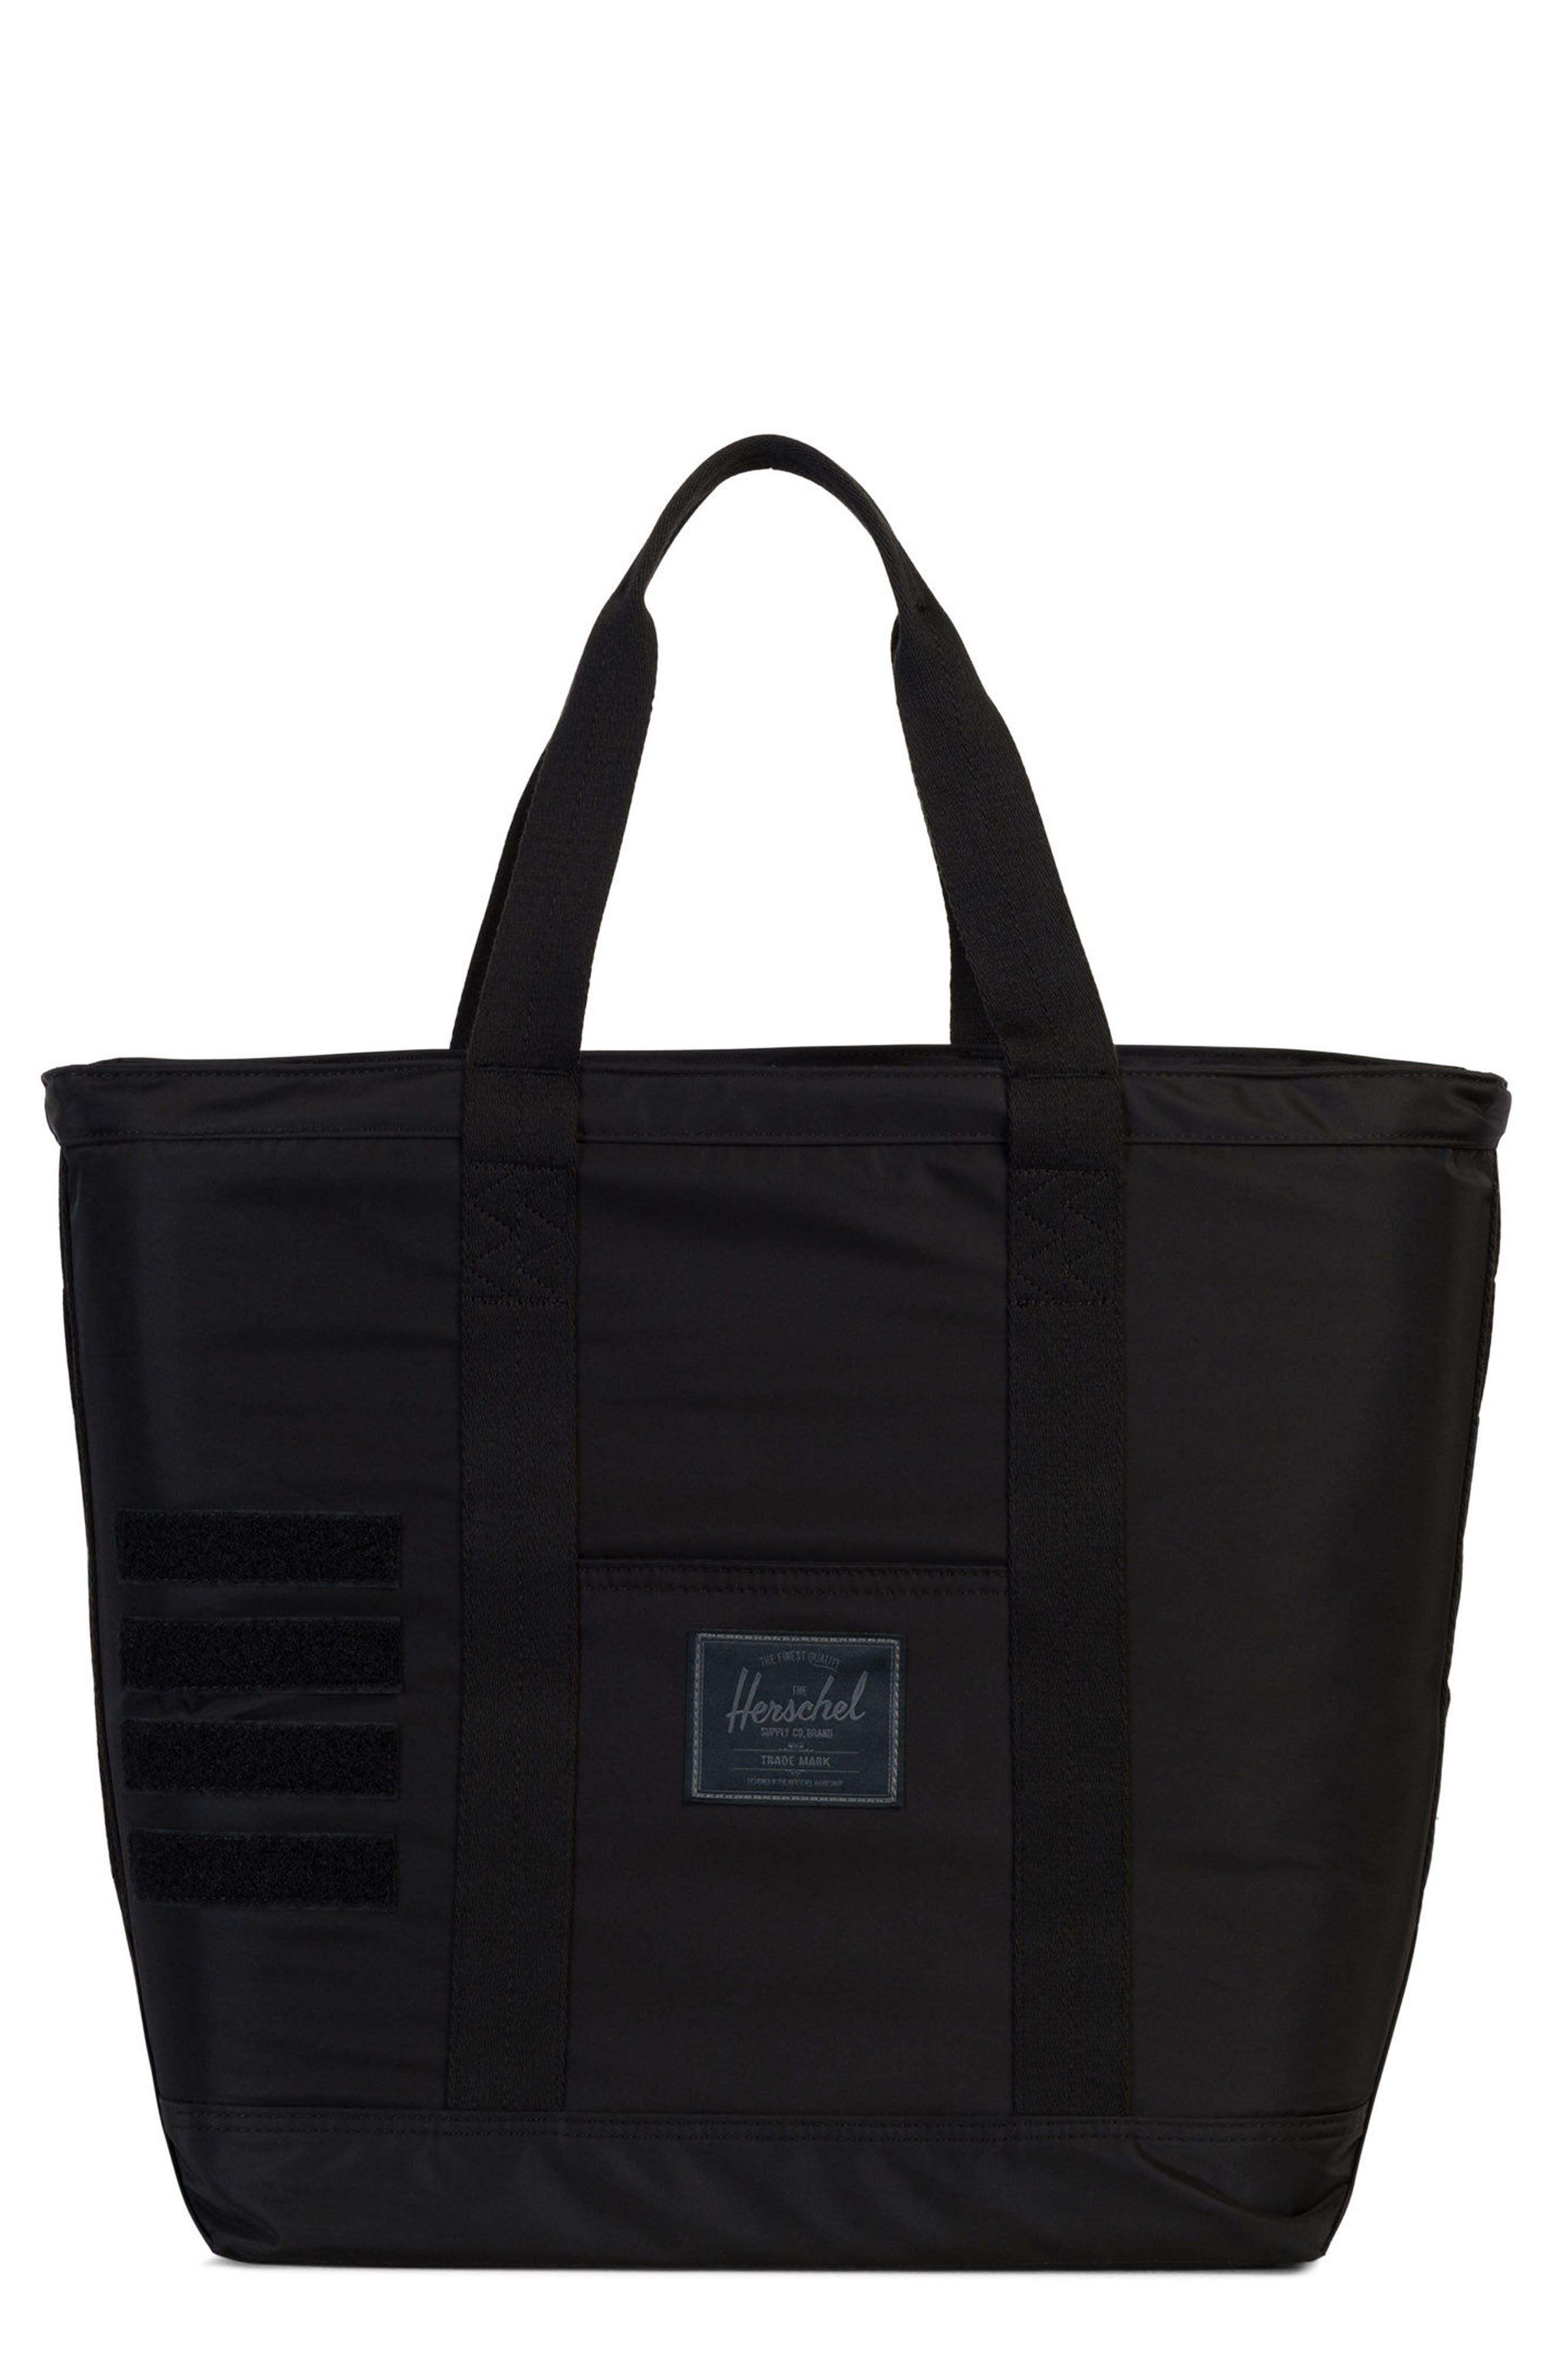 Bamfield Surplus Collection Tote Bag,                         Main,                         color, Black